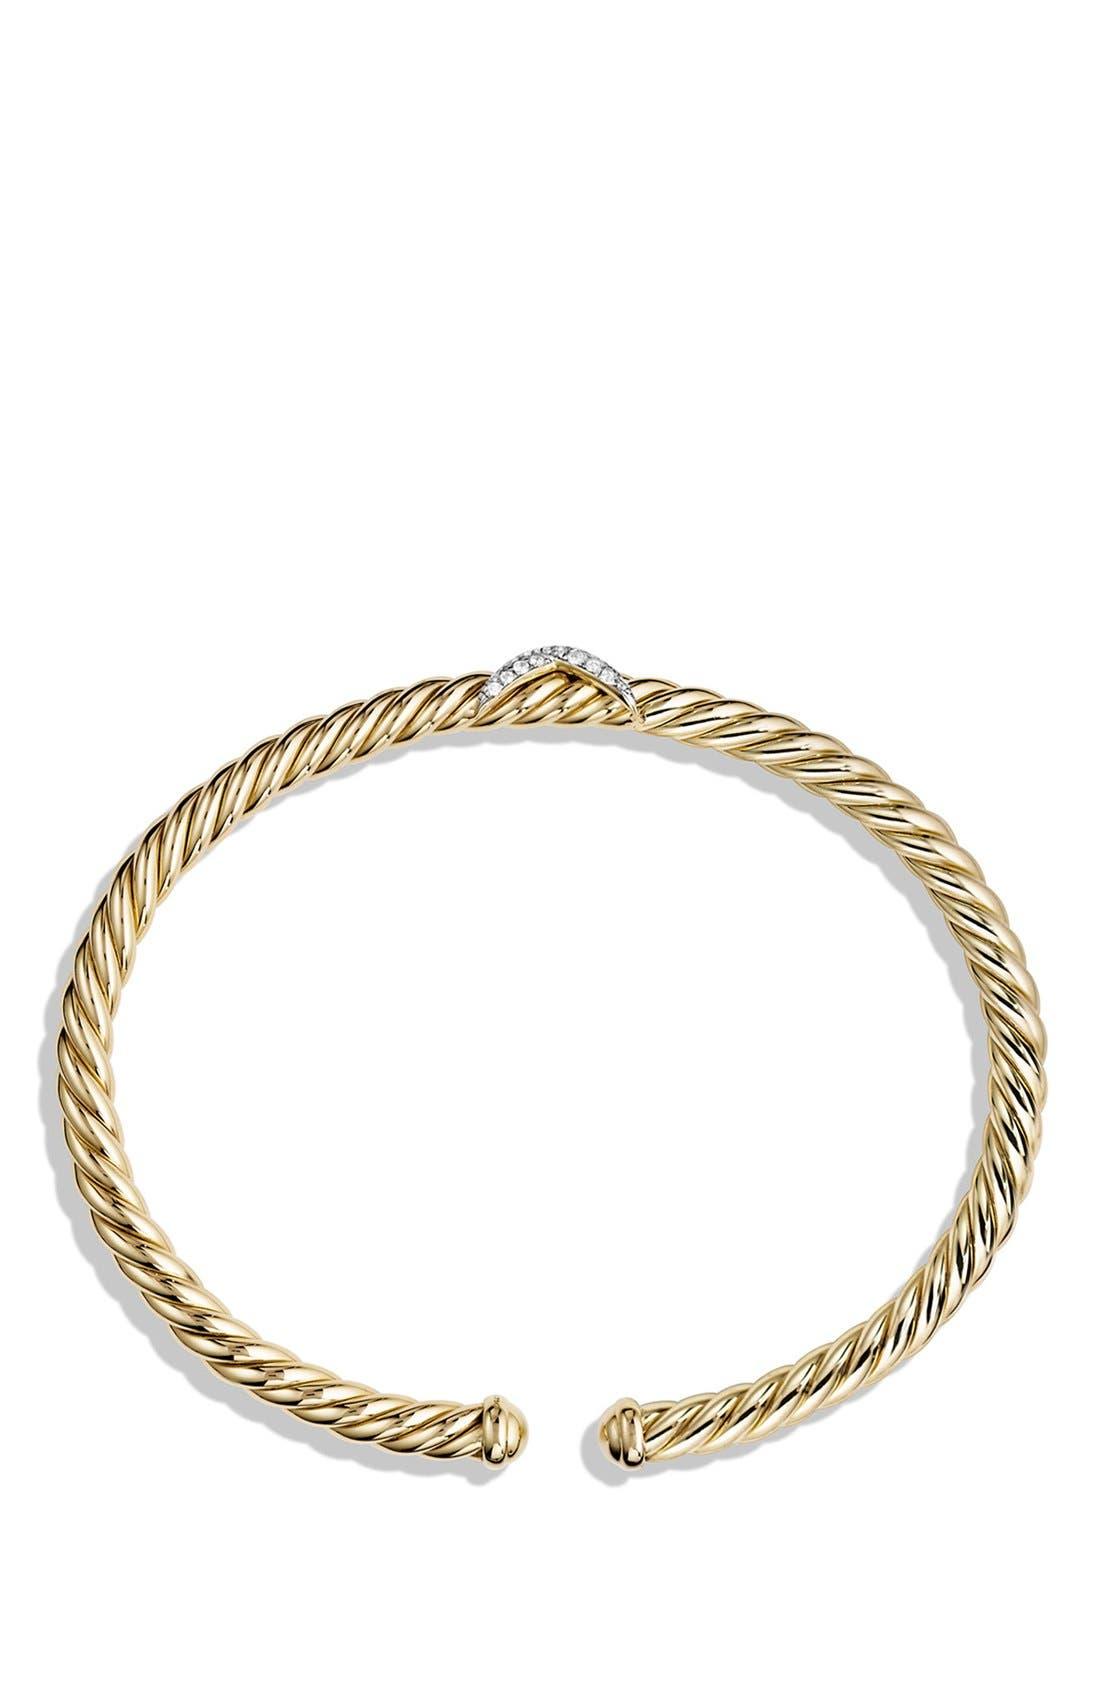 'X - Cablespira' Bracelet with Diamonds in 18k Gold,                             Alternate thumbnail 2, color,                             DIAMOND